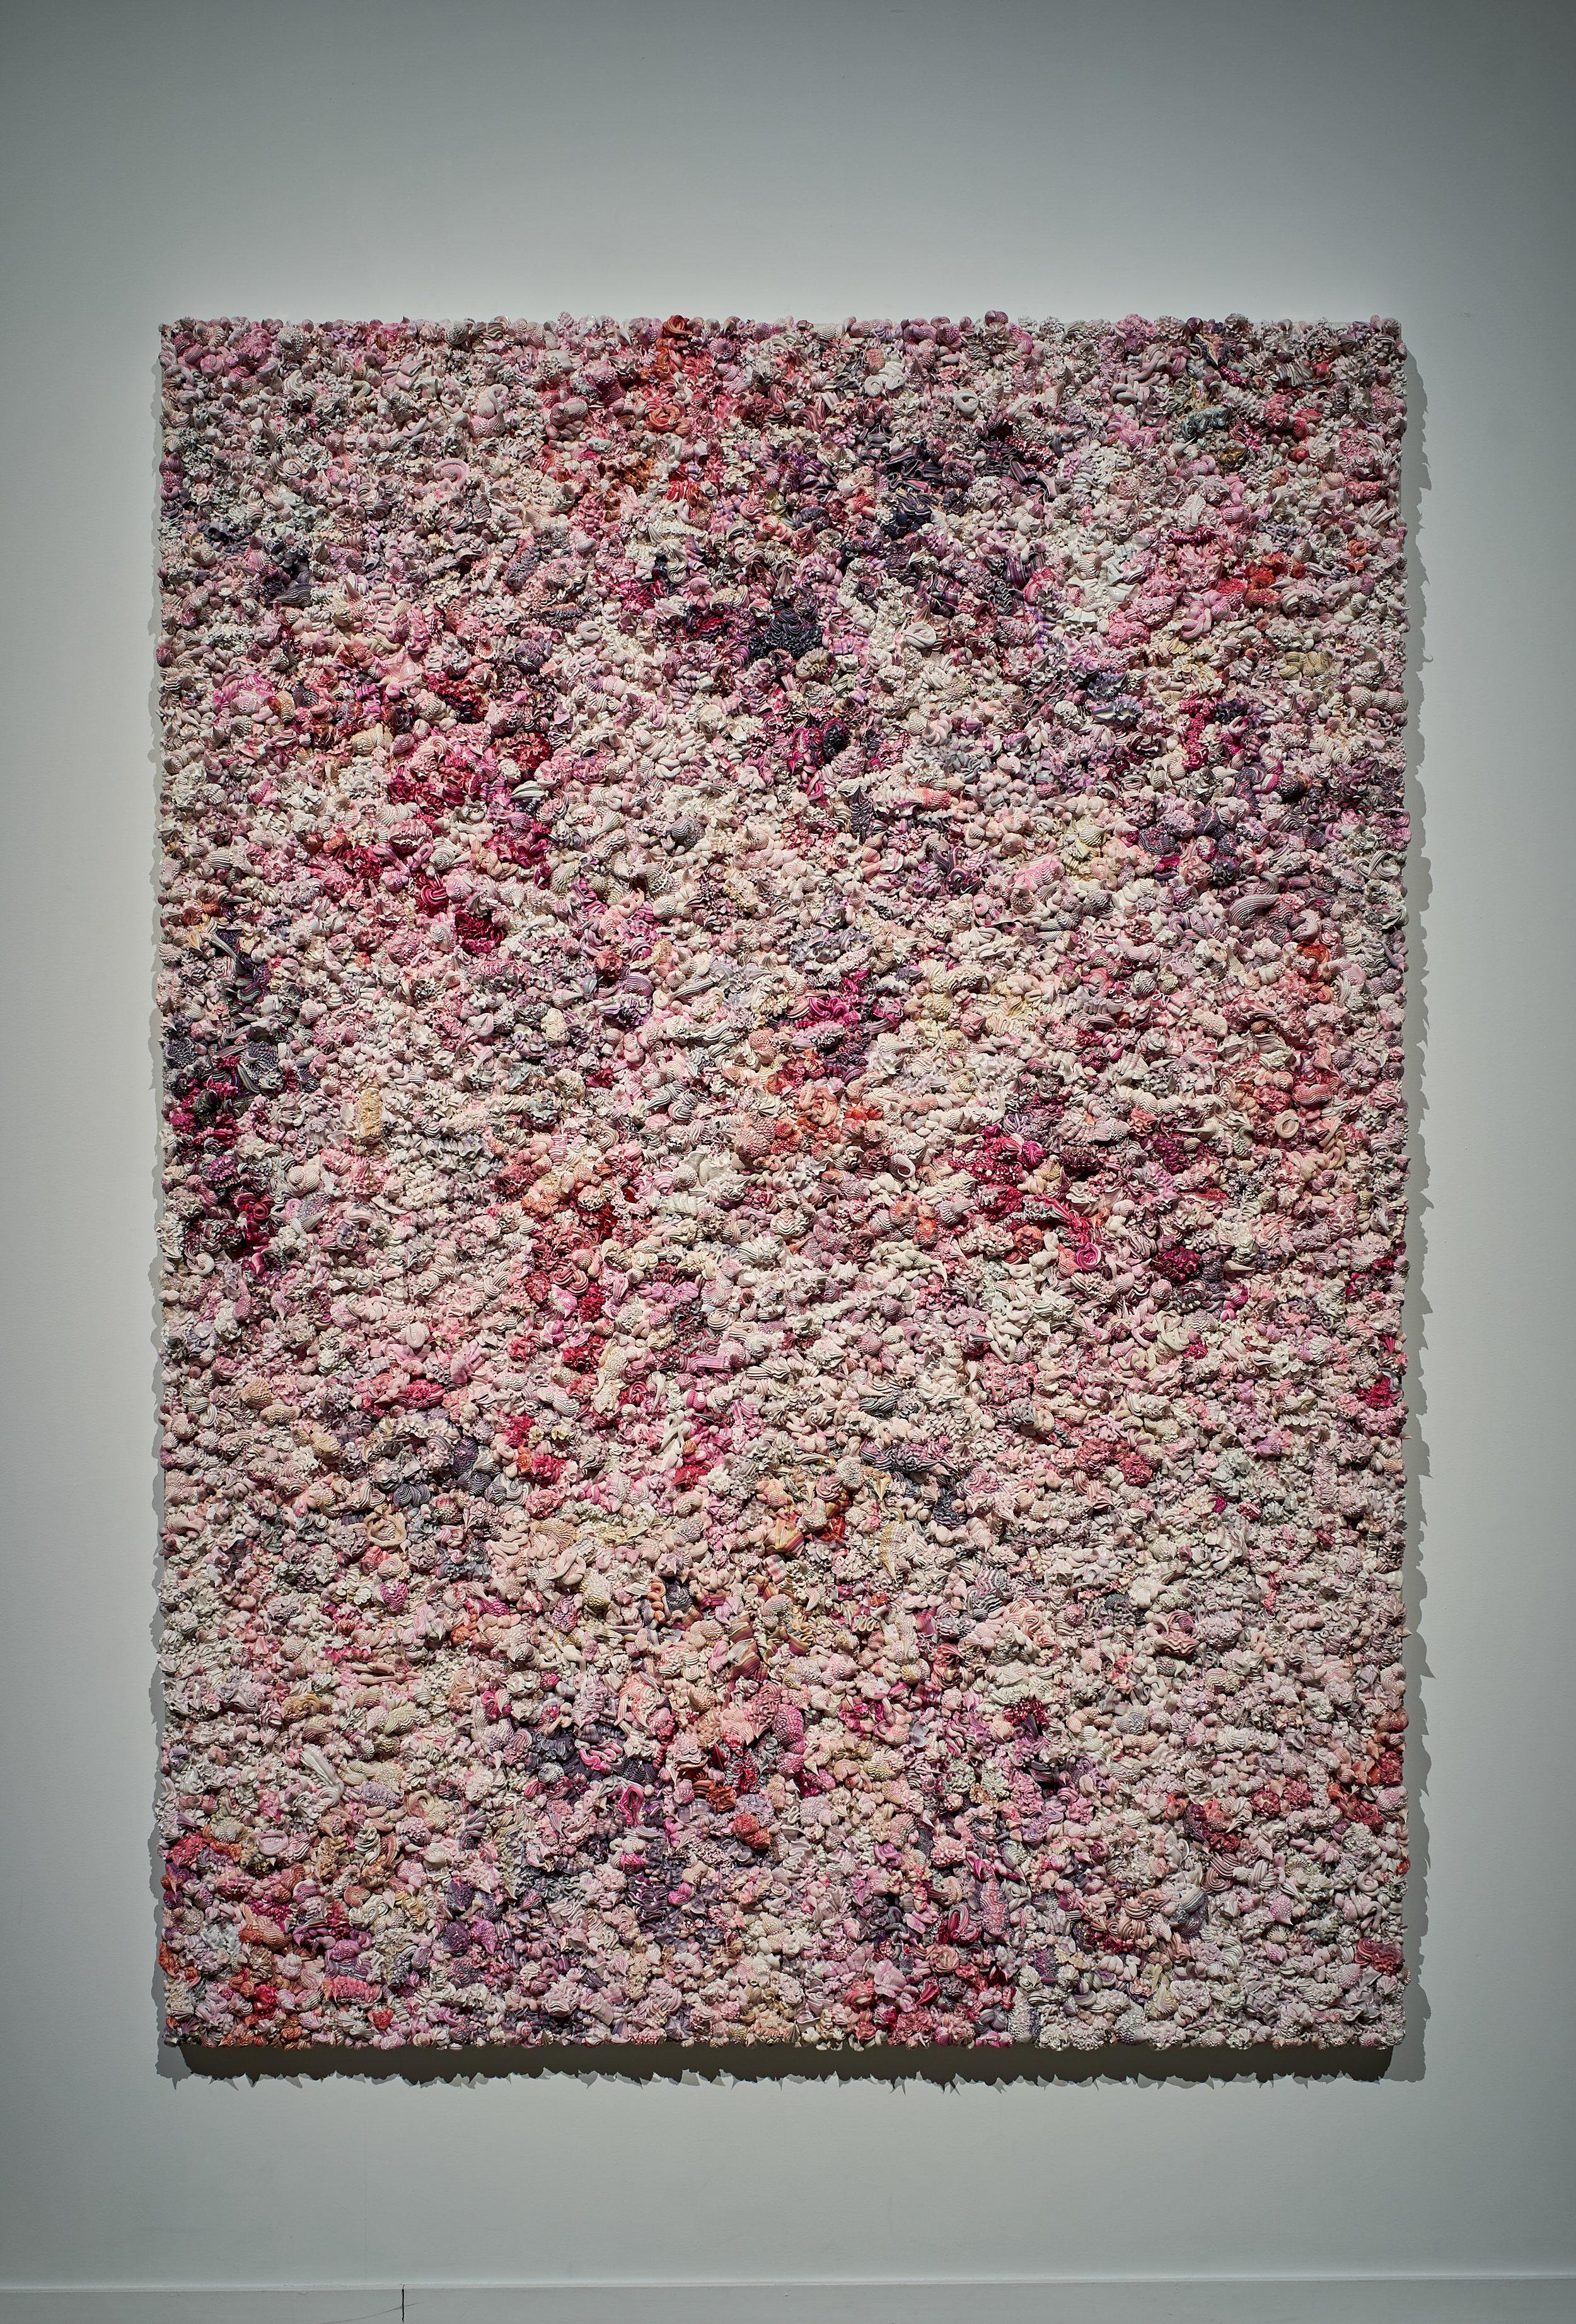 Xu Zhen ,  Under Heaven -- 2808TV1512 , 2015, Oil on canvas, aluminium, 98 3/8′′ x 70 3/4′′ x 5 1/2′′ (249,9 x 179,7 x 14 cm)